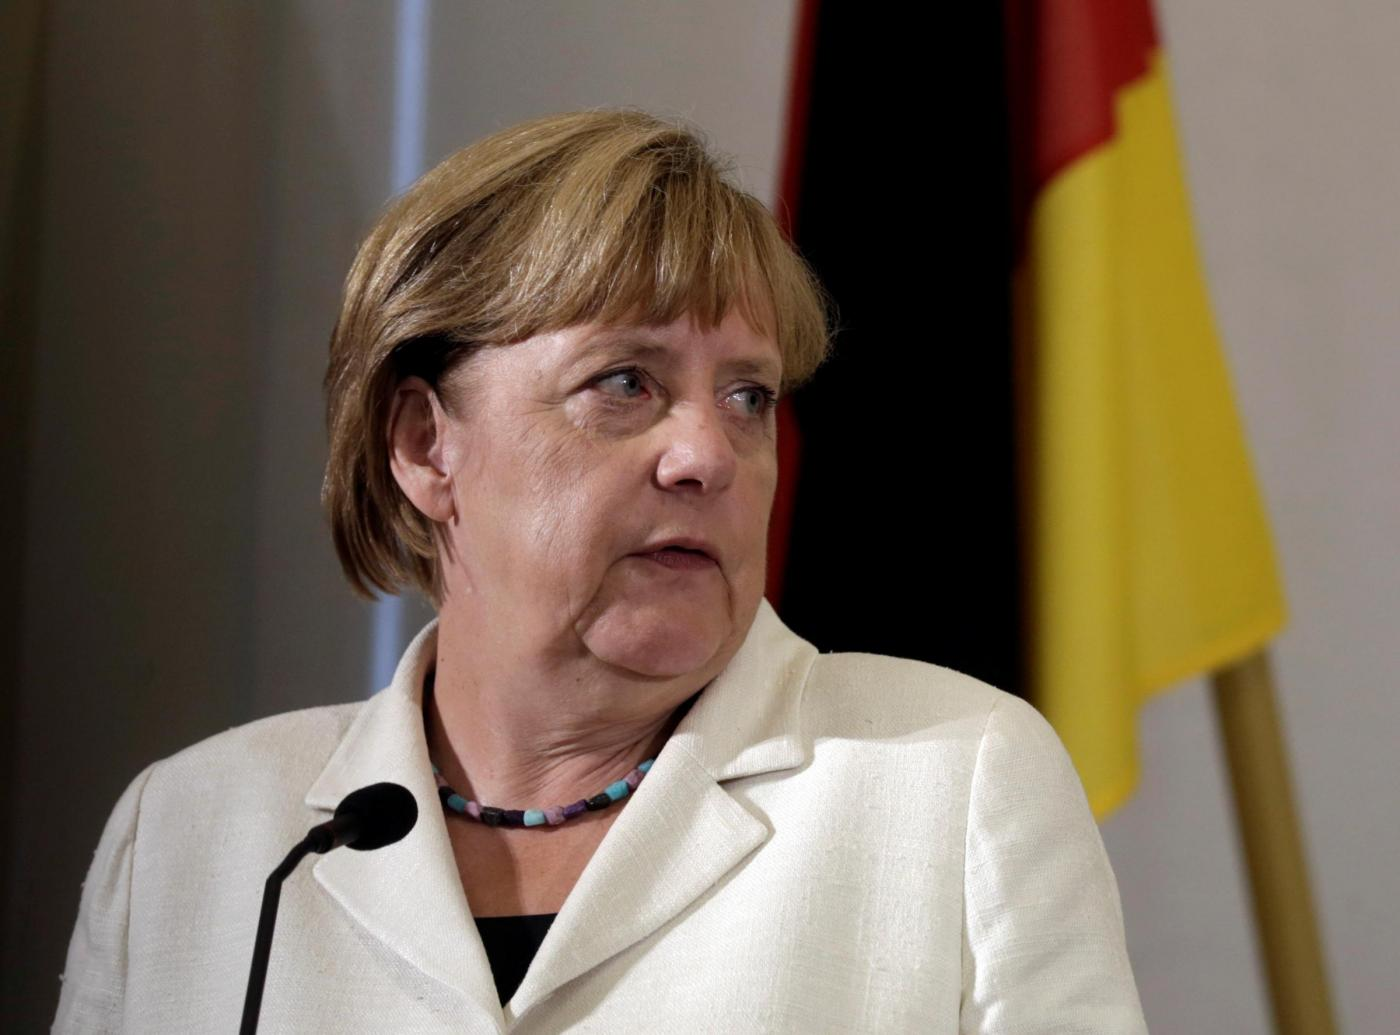 Tallinn, Angela Merkel incontra il primo ministro estone